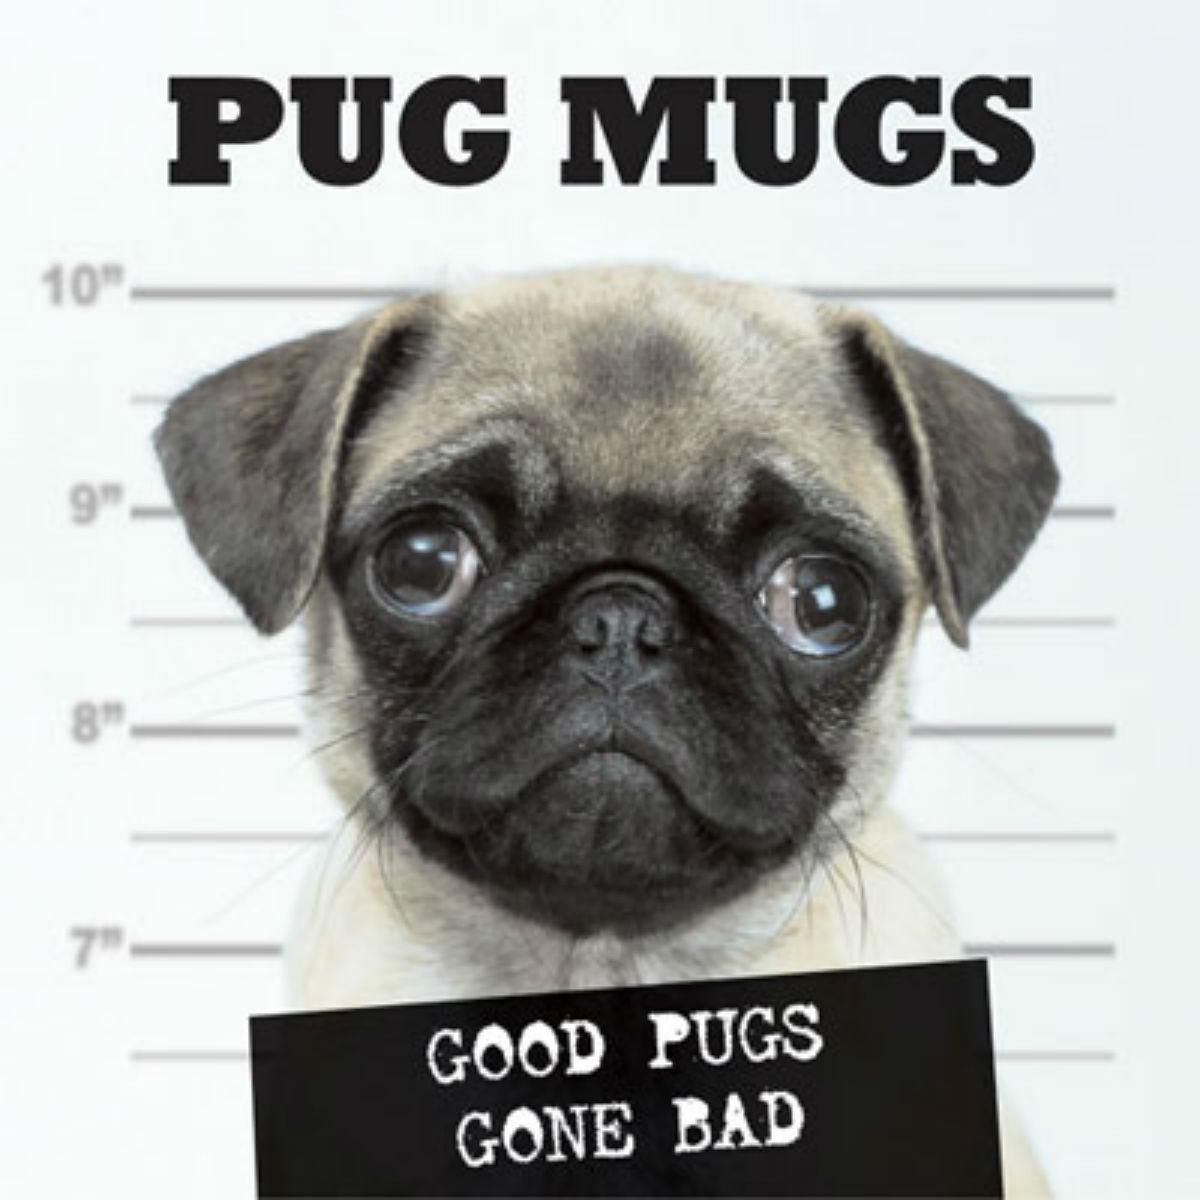 Pug Mugs Book For Humans Good Pugs Gone Bad Pug Mug Cute Pugs